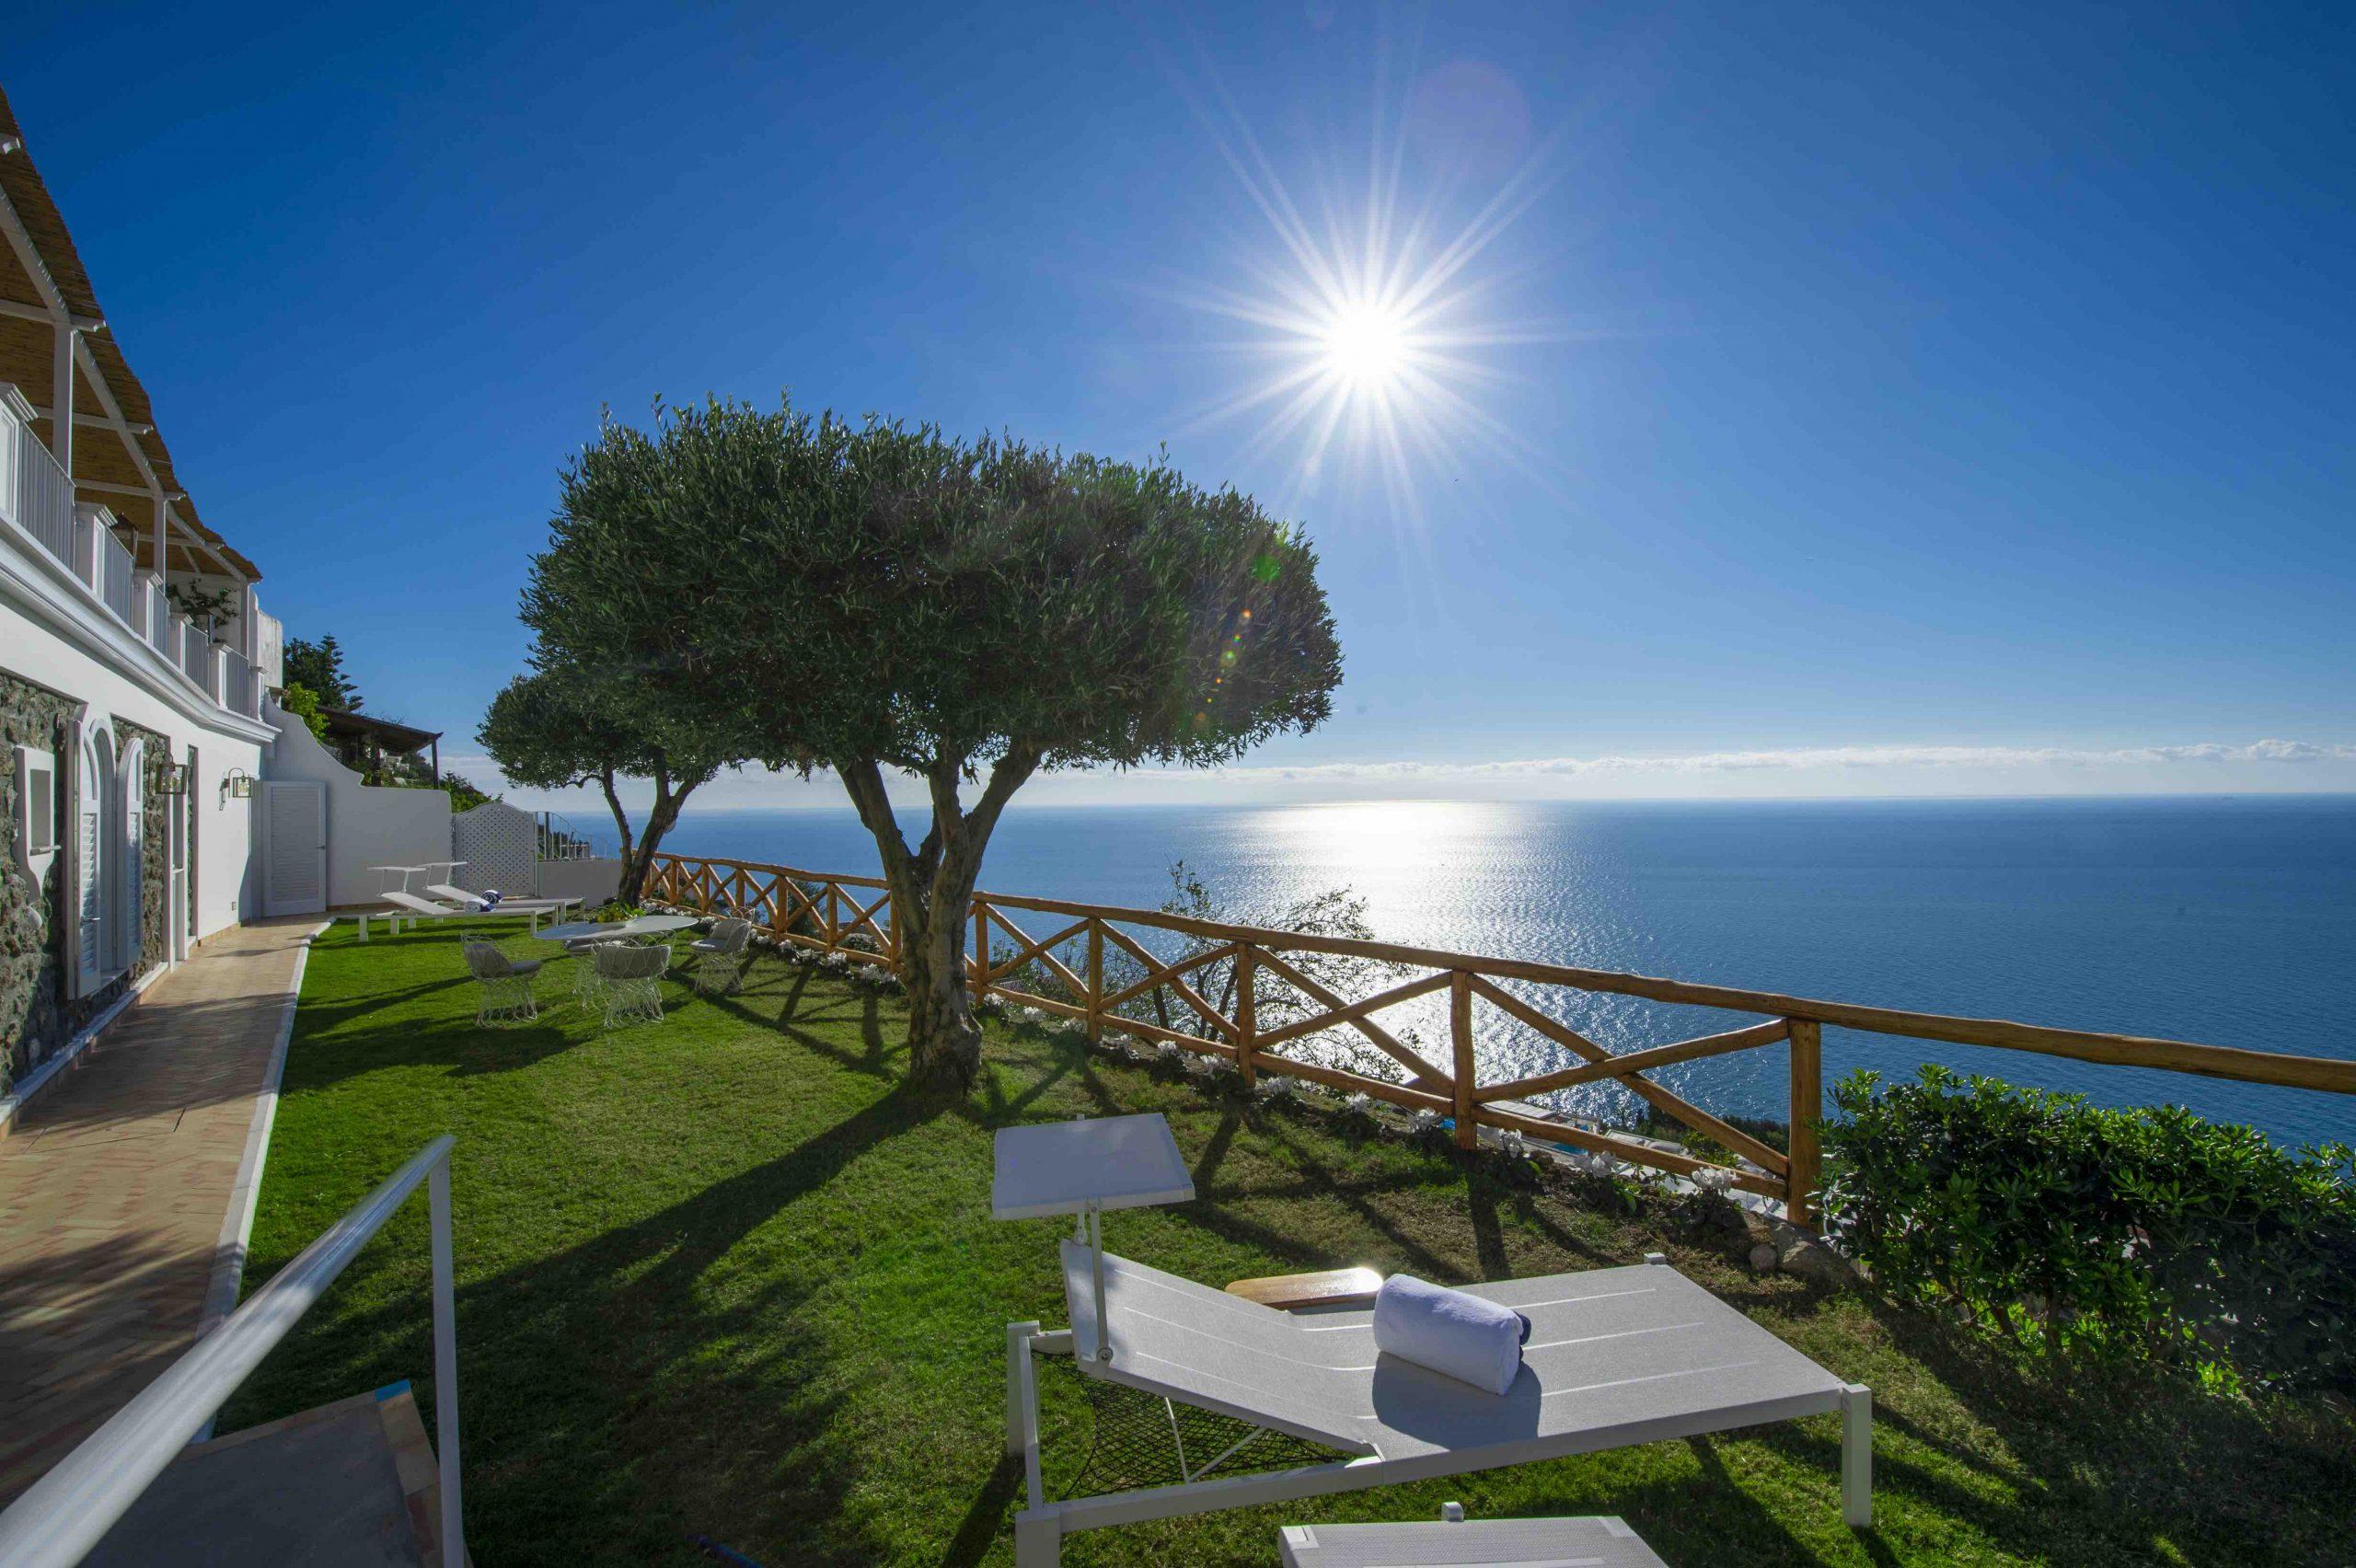 Amalfi Coast Exclusive Villa in Praiano with Pool & View - Gardens